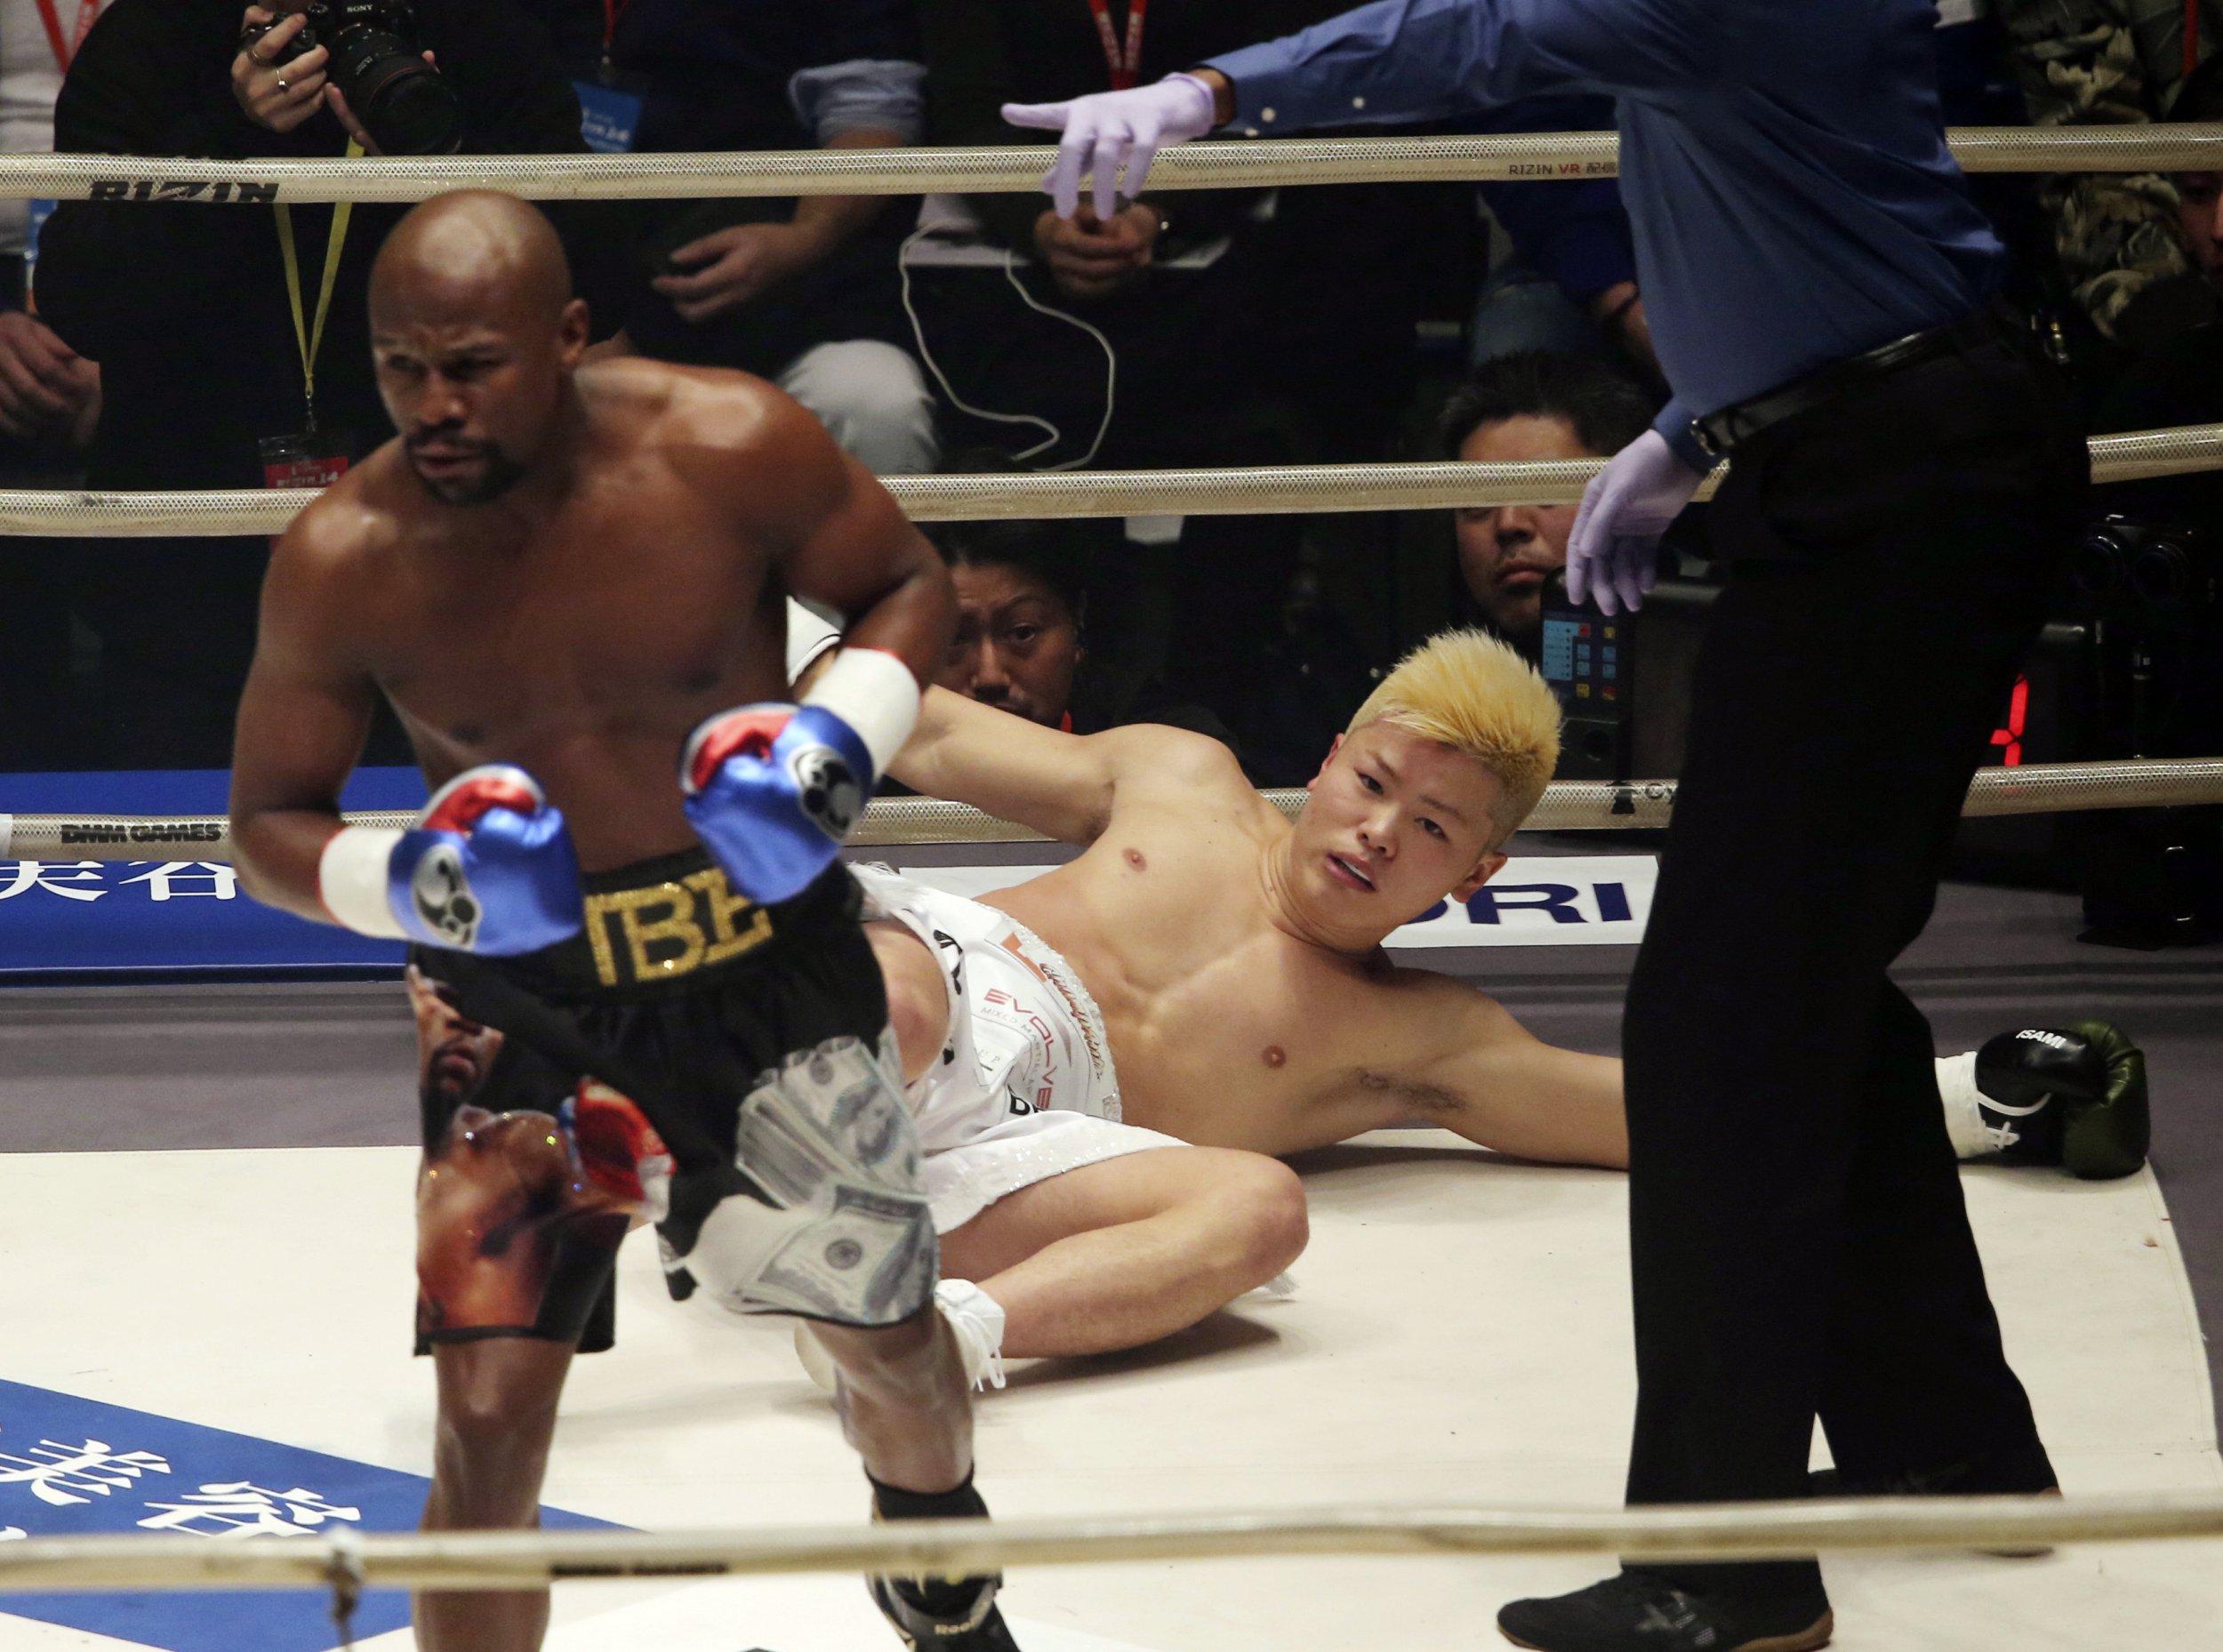 Floyd Mayweather destroys Tenshin Nasukawa with swift KO in first round